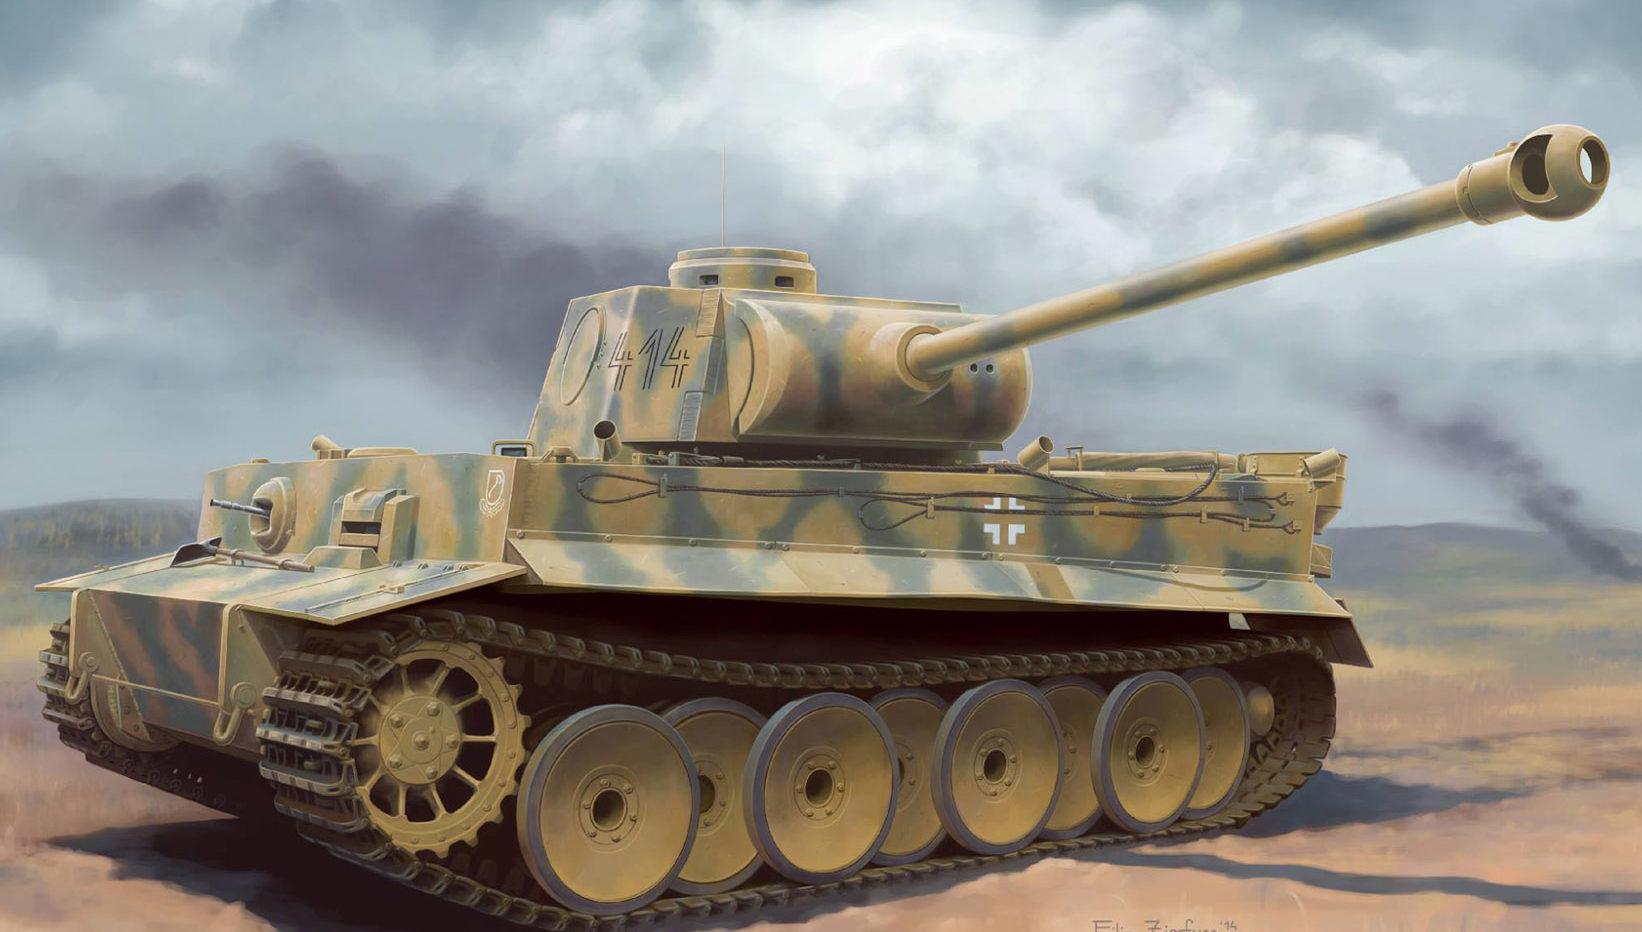 Zierfuss Filip. Танк Tiger I Ausf. H2.